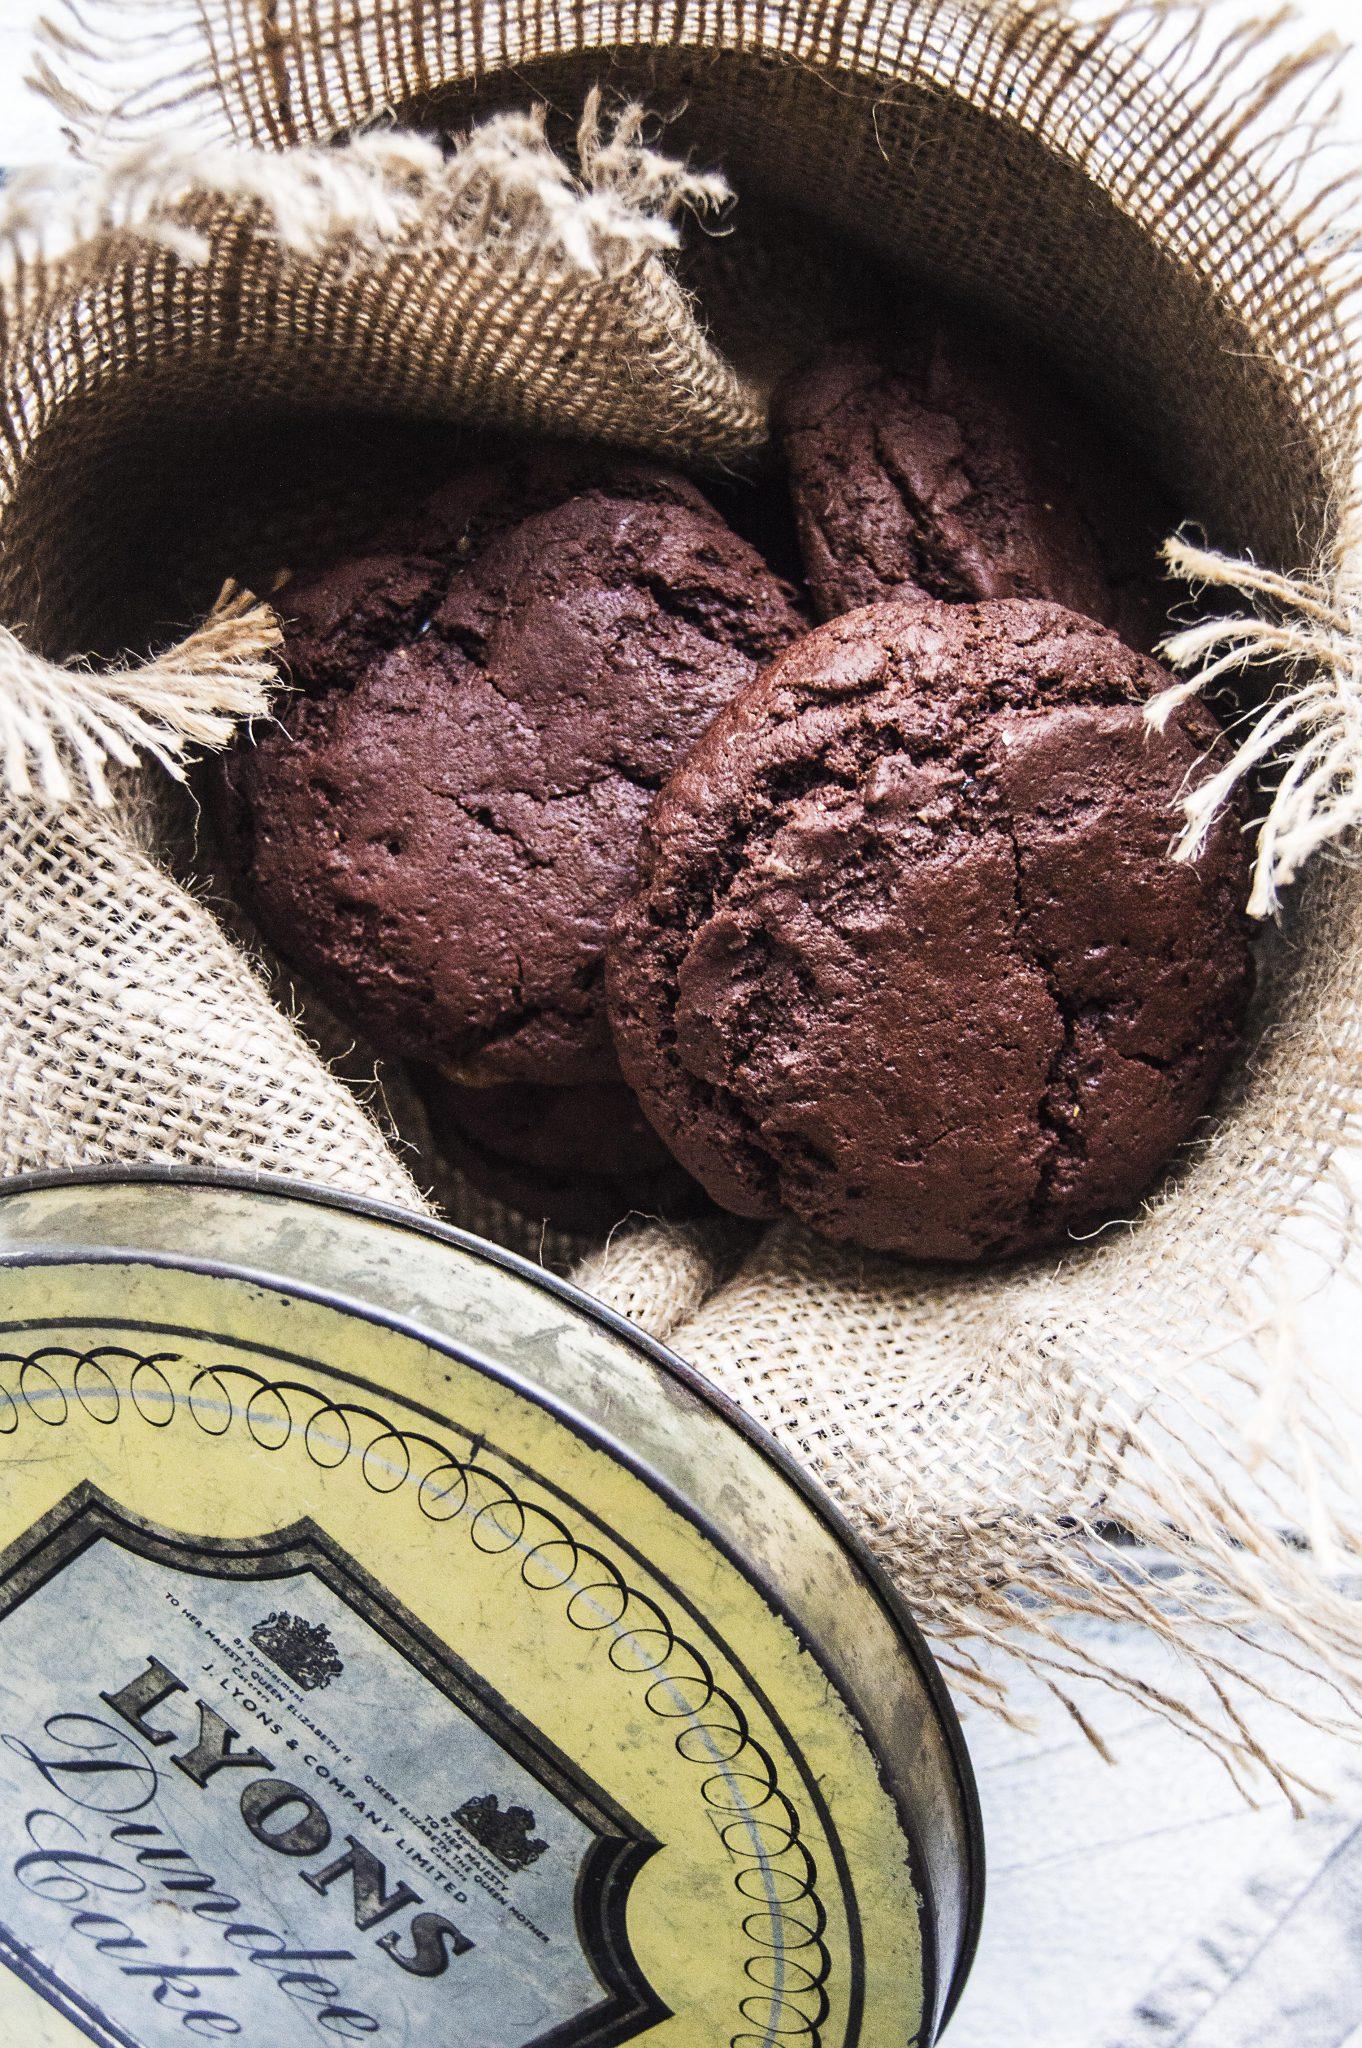 Salted Caramel Stuffed Chocolate Fudge Cookies